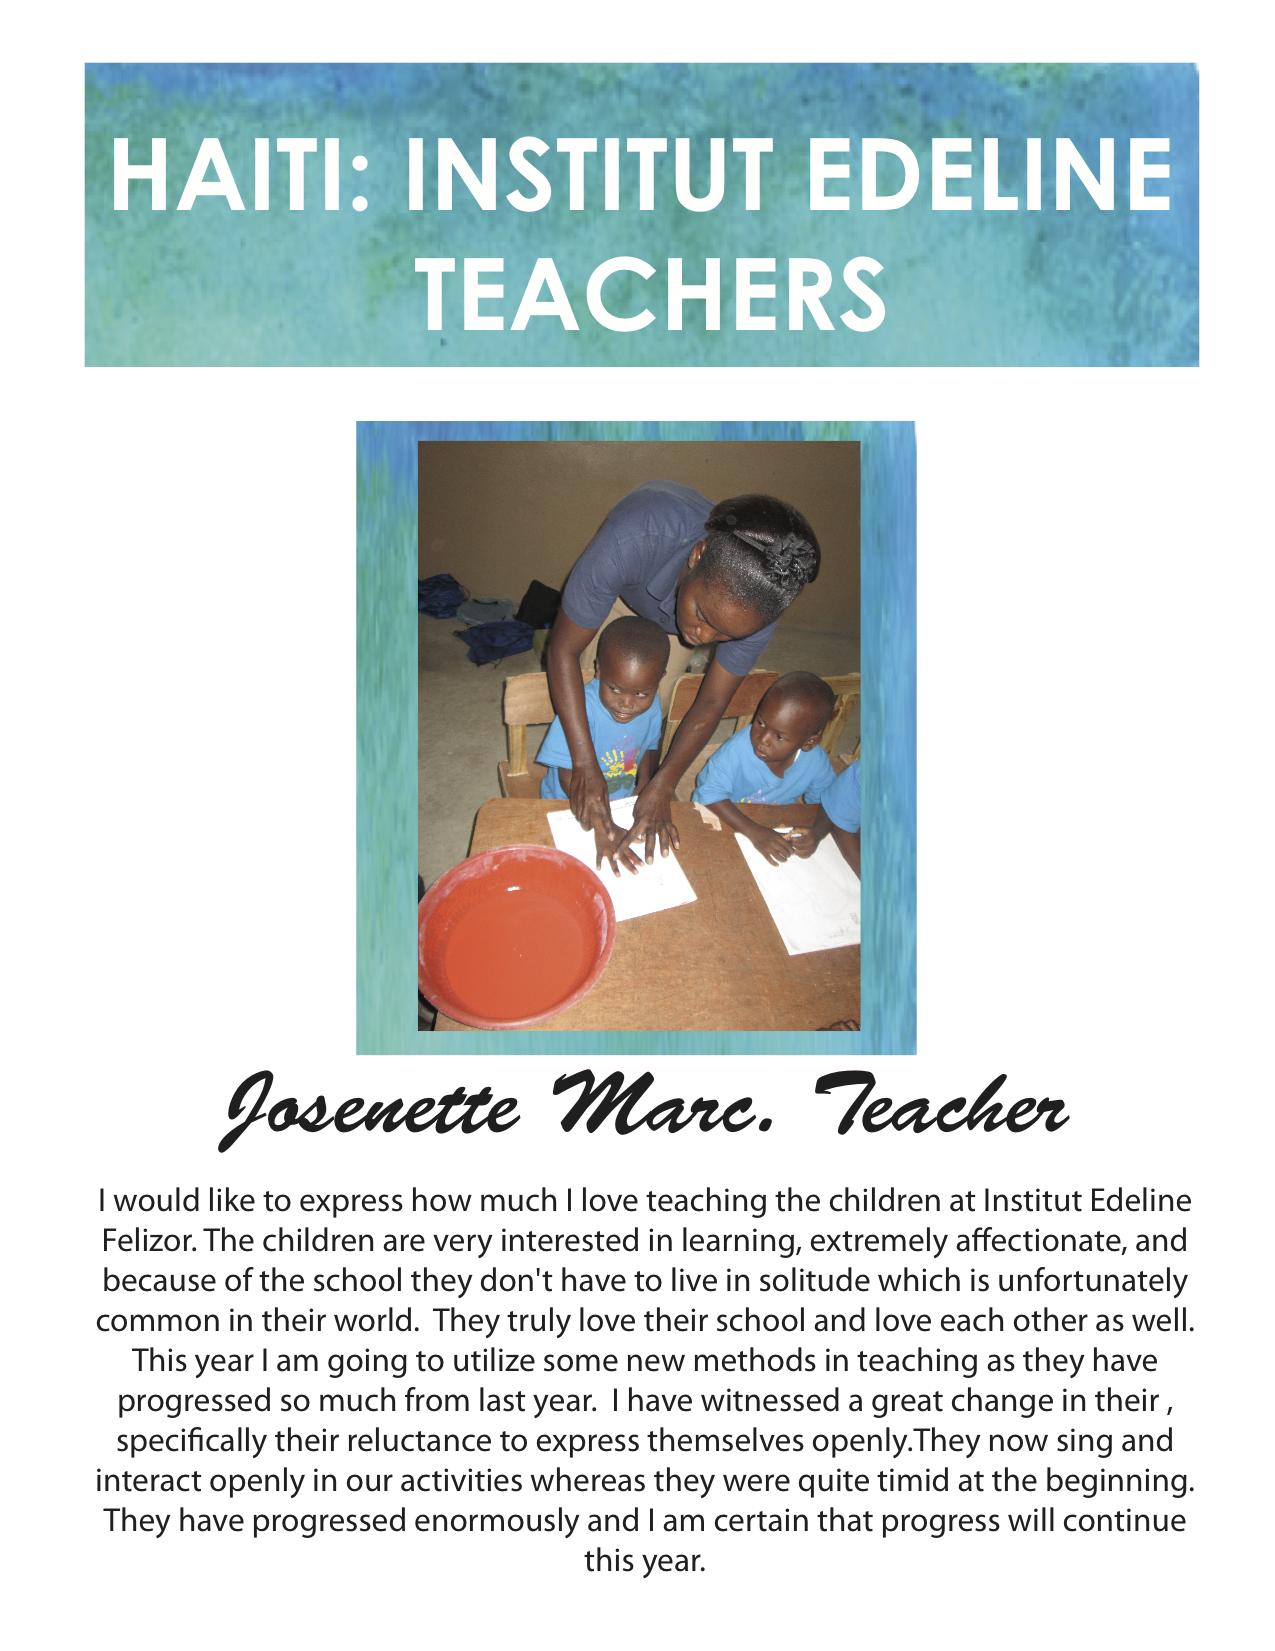 HAITI_TEACHER.jpg